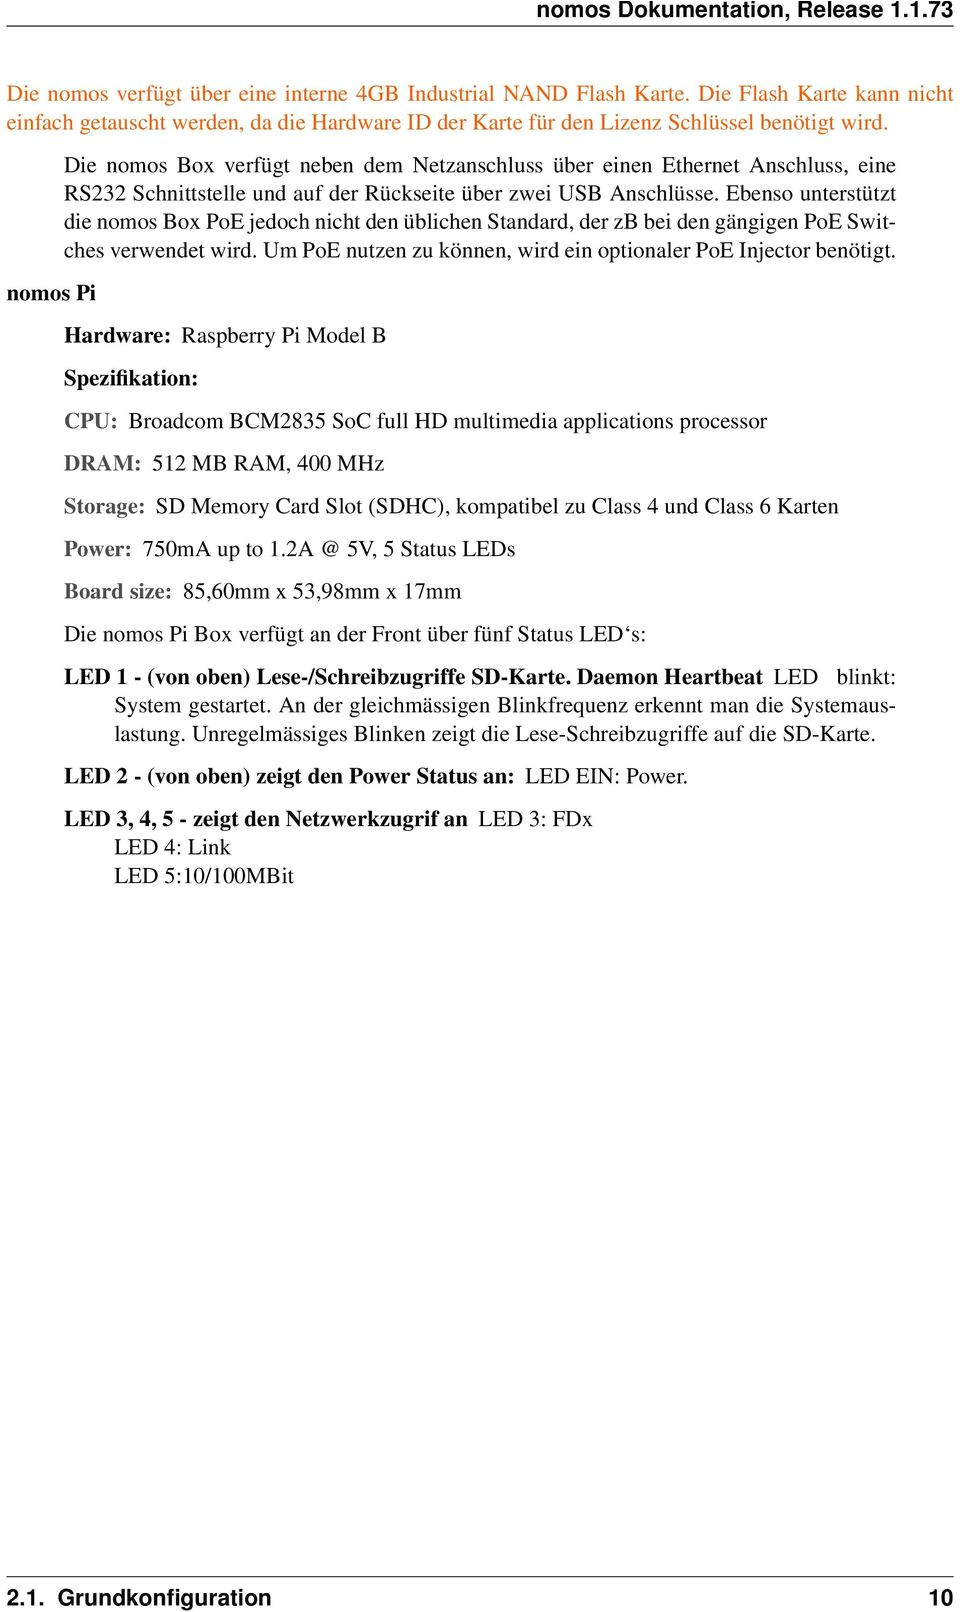 page 13 jpg